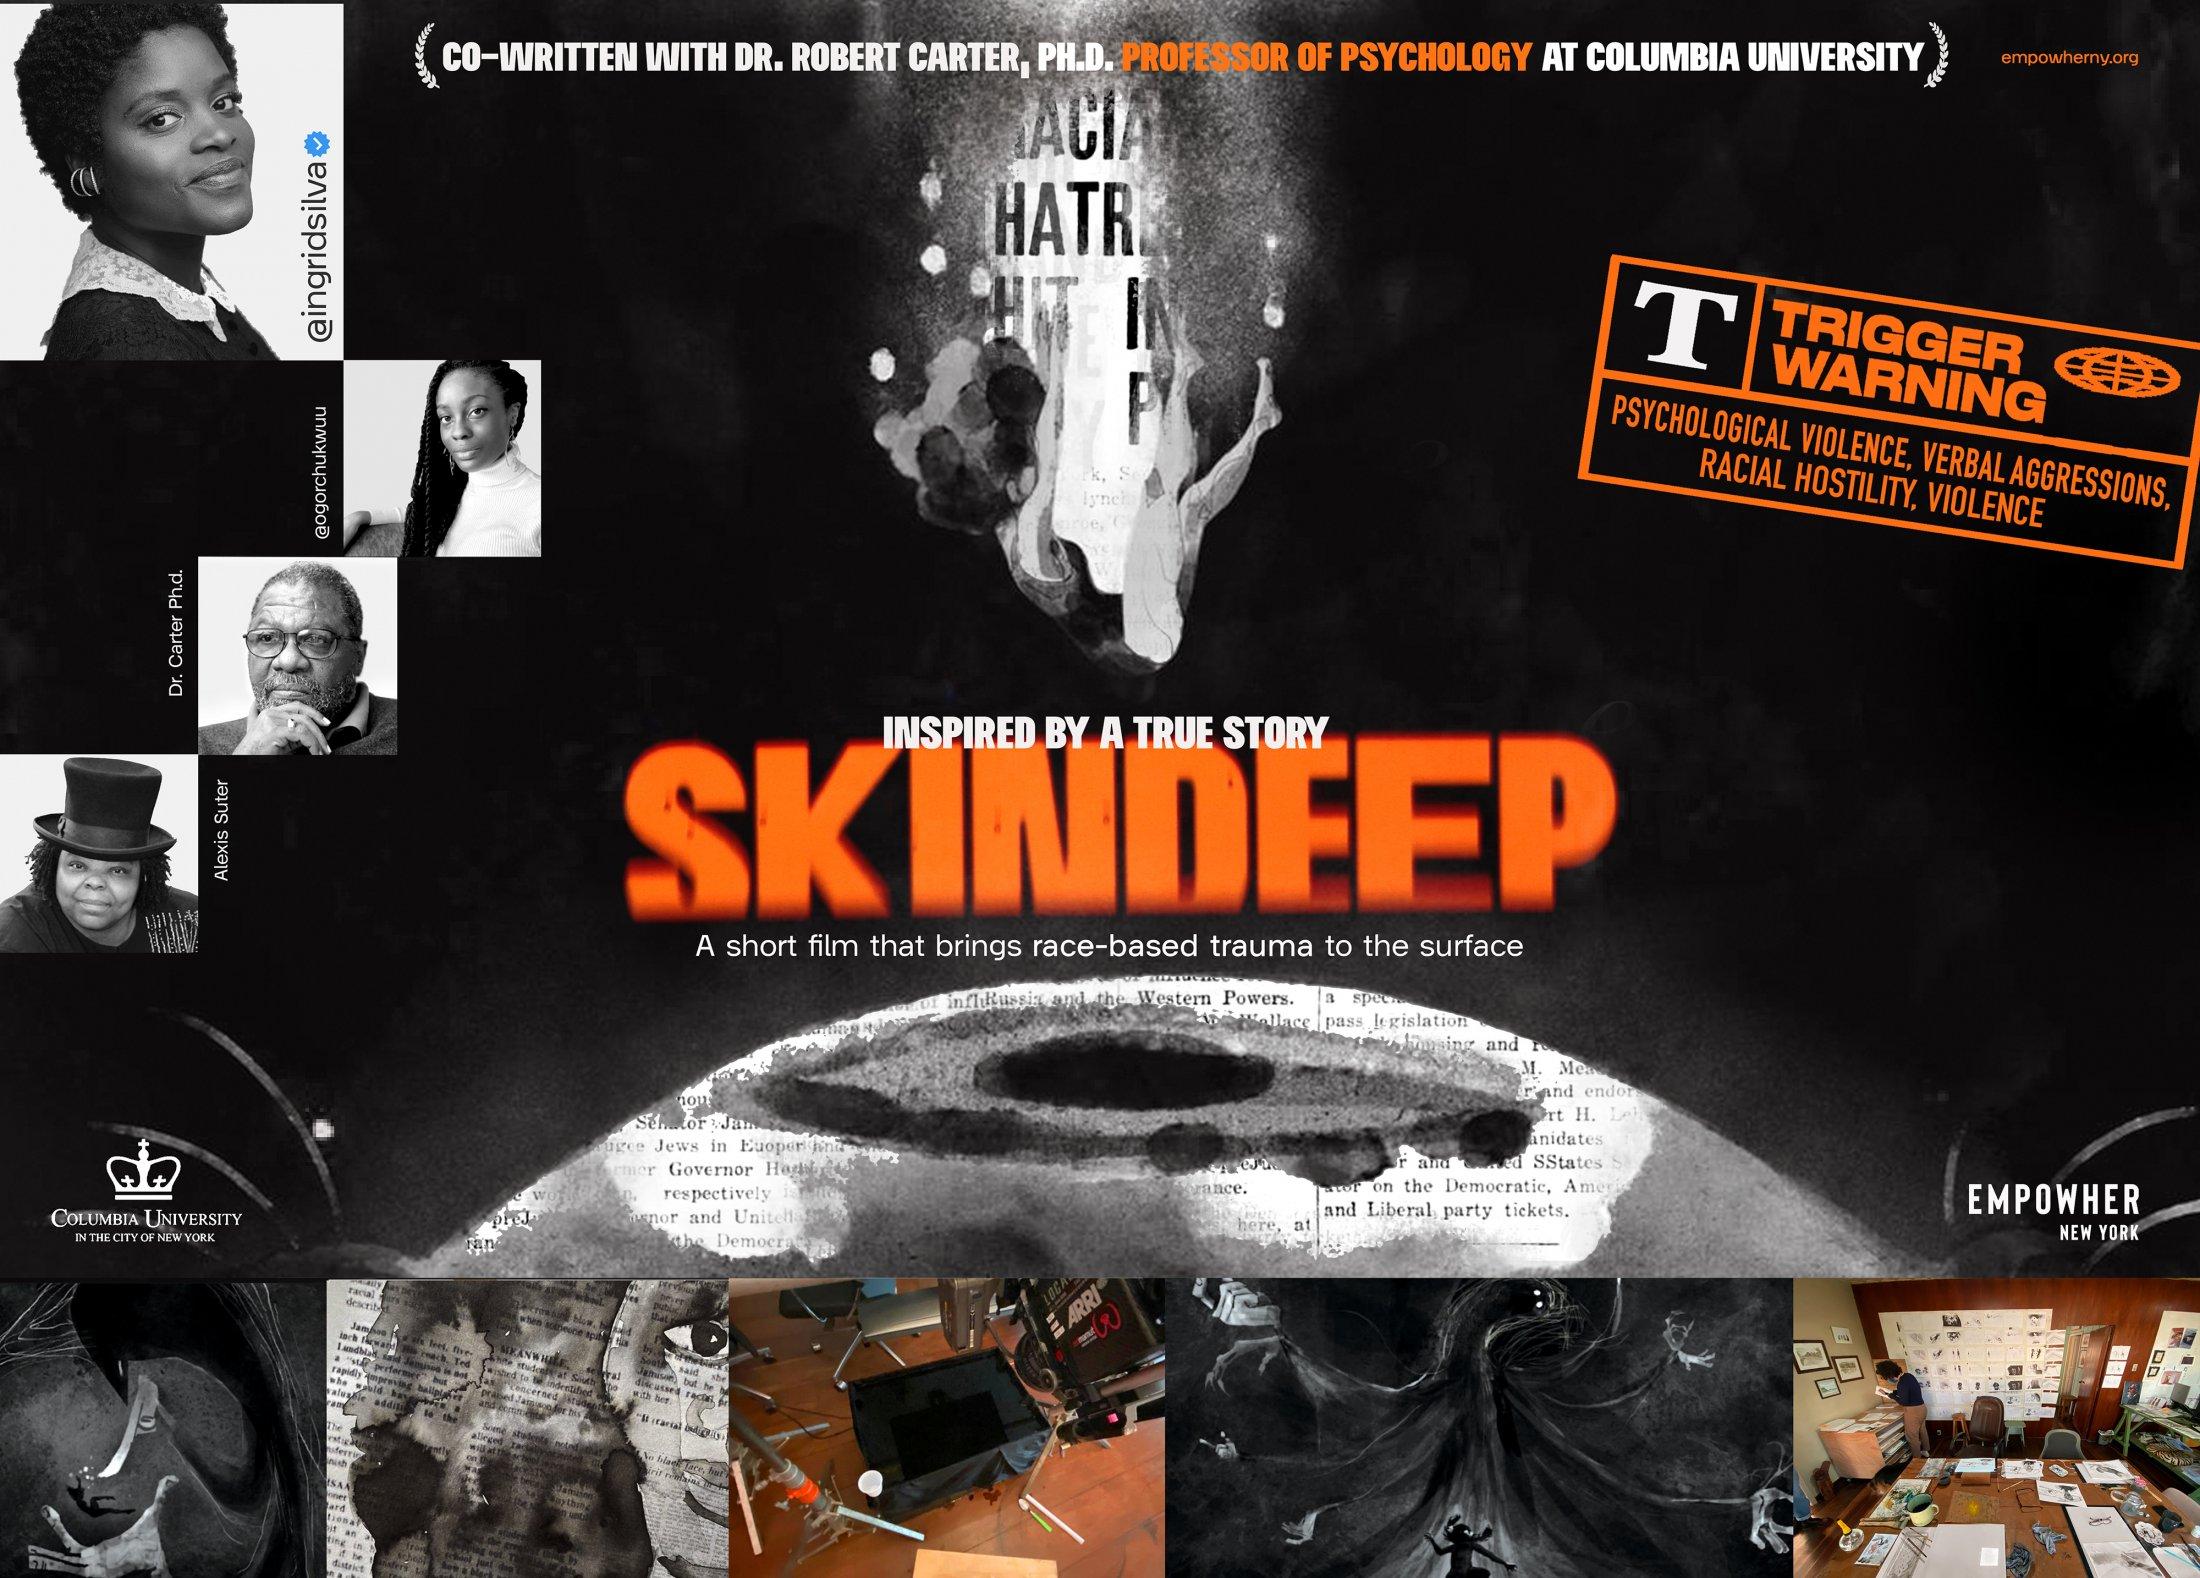 Thumbnail for Skindeep